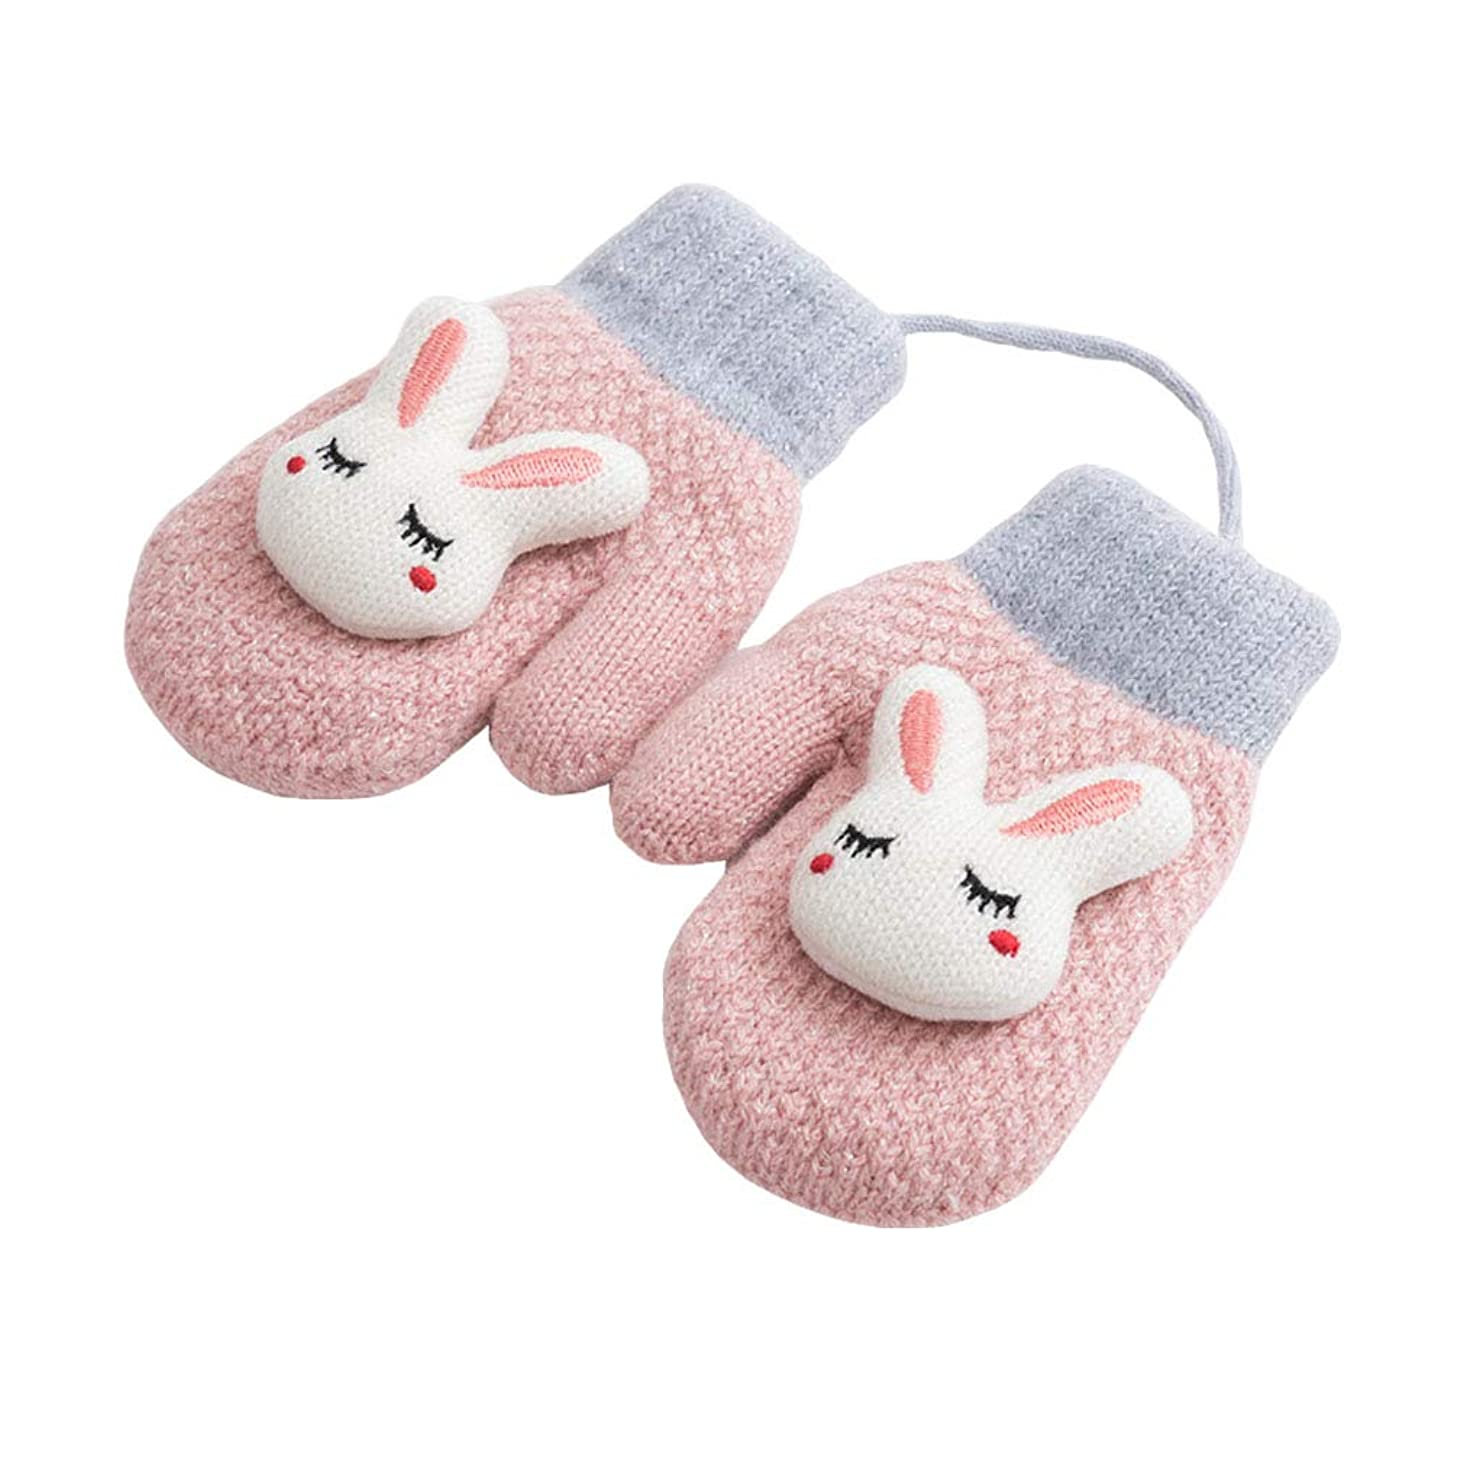 Toddler Baby Knitted Gloves Cute Winter Fleece Ski Mittens Xmas Gift for Kids